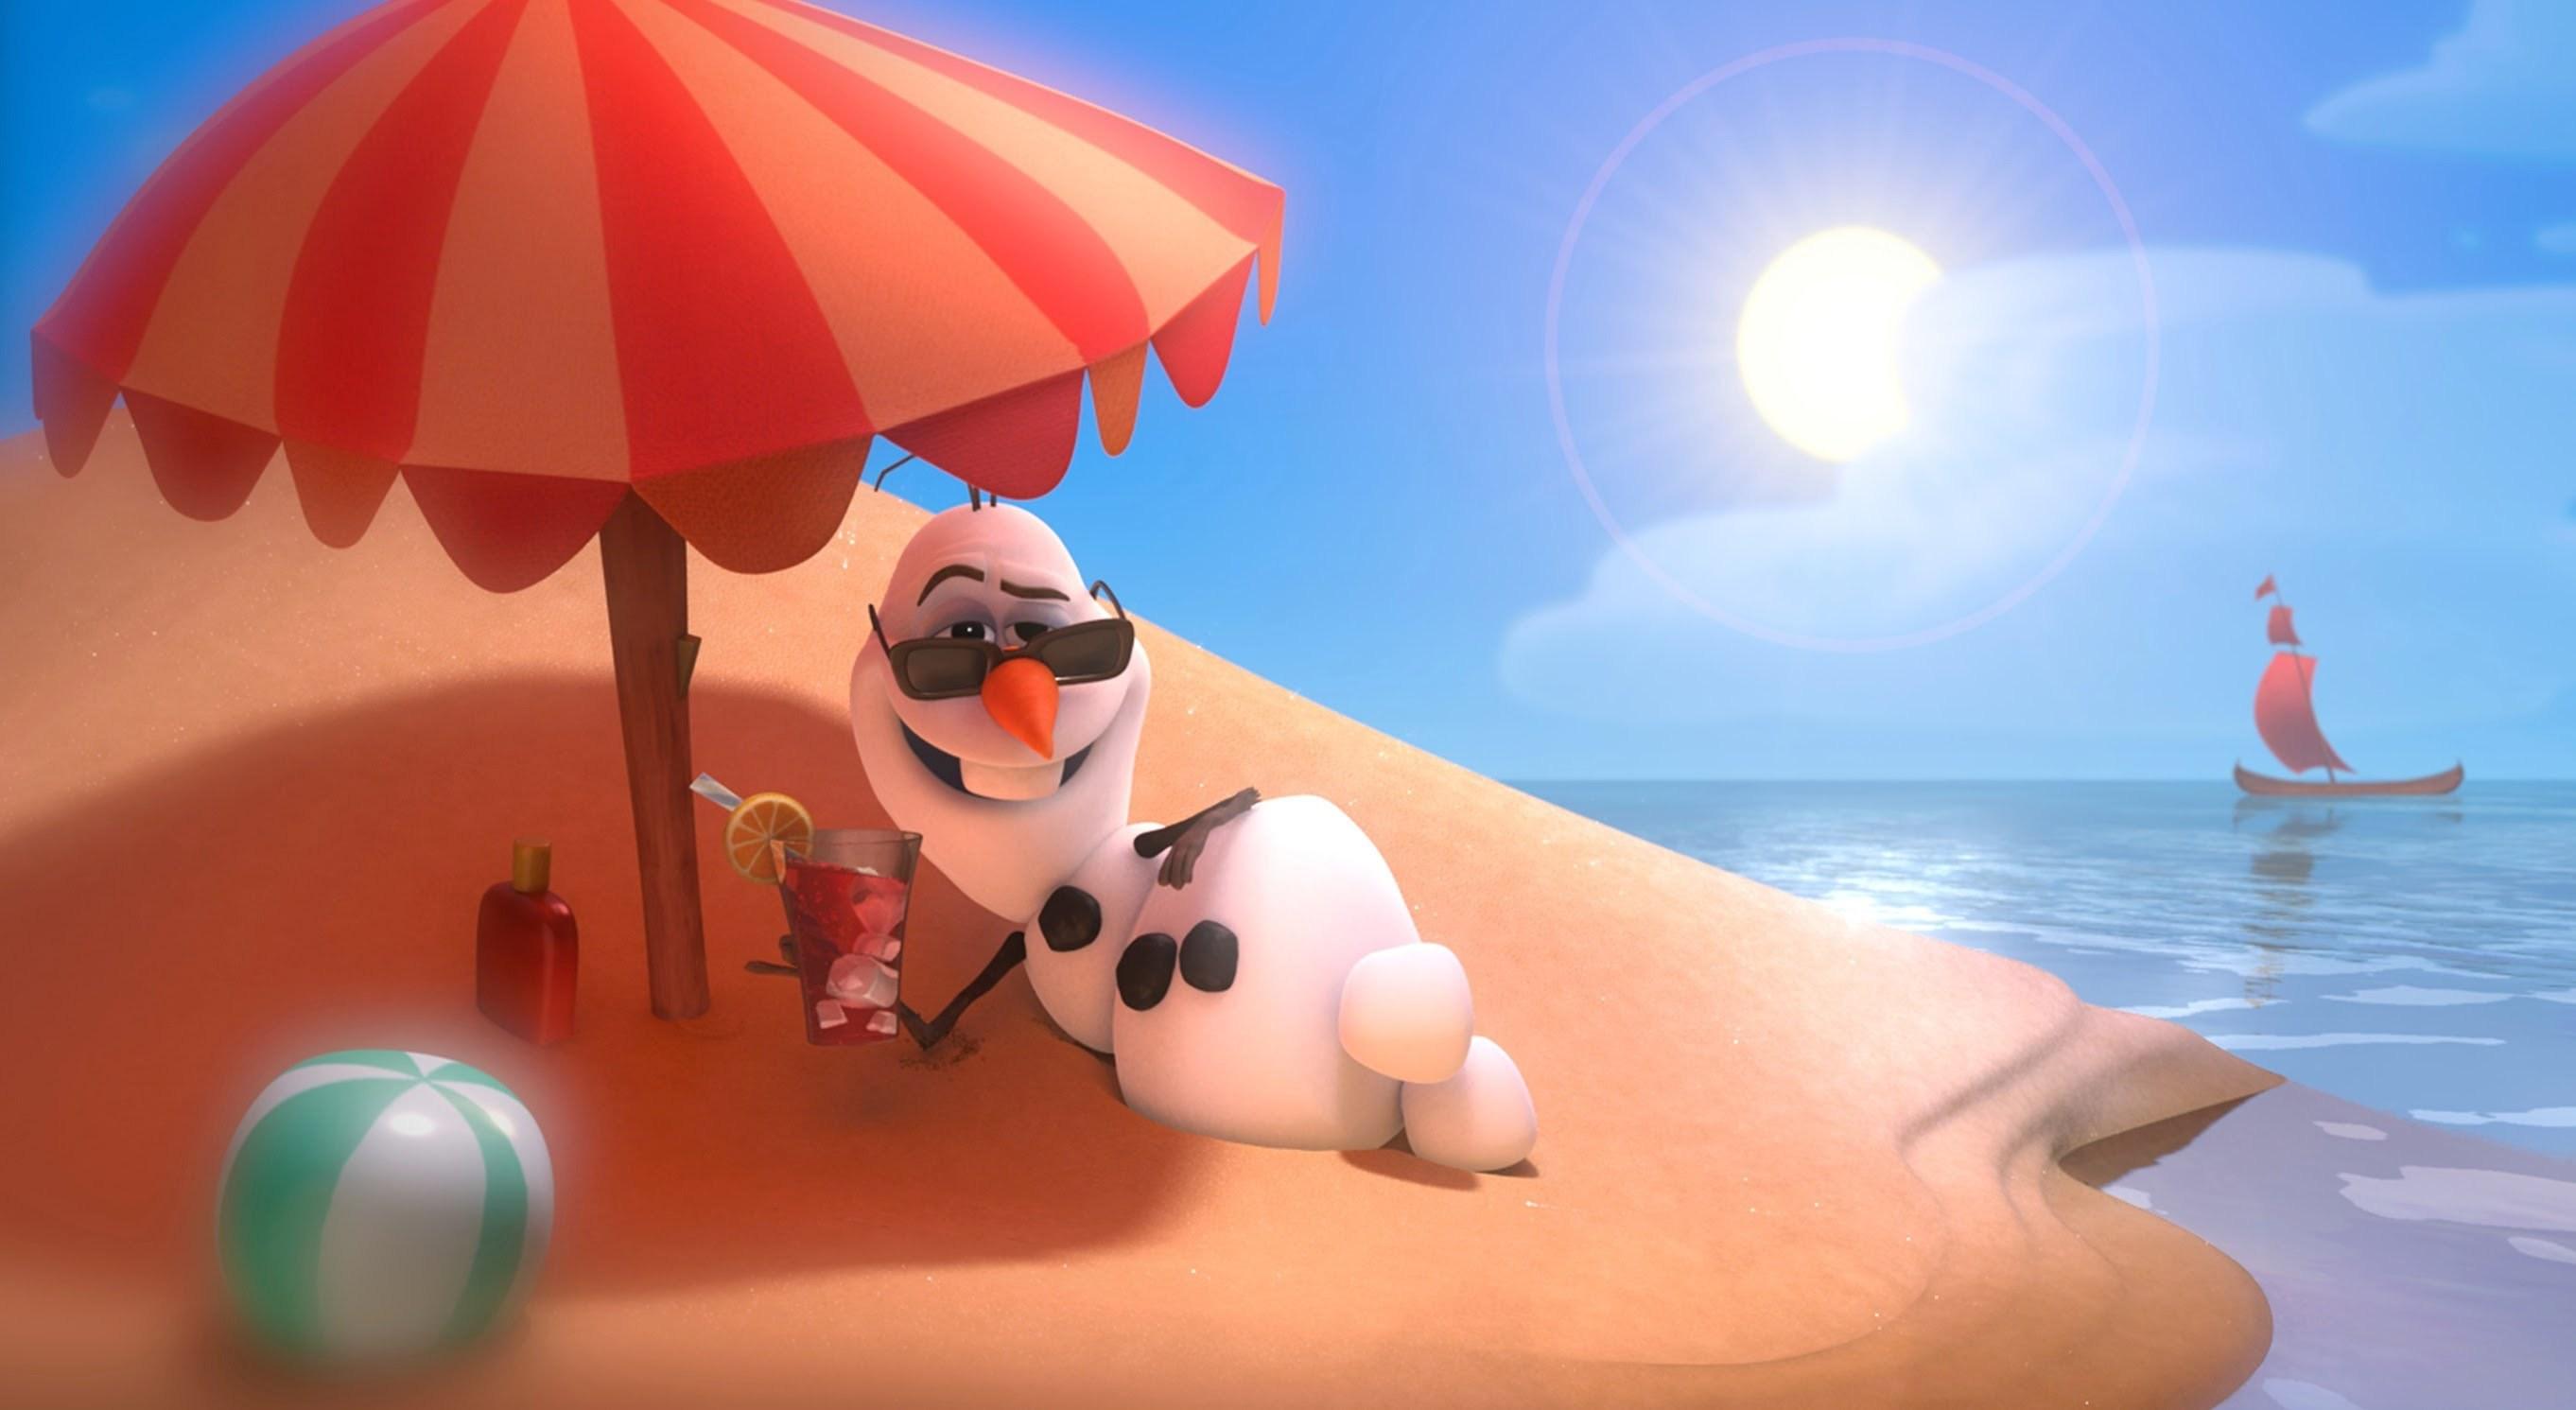 olaf-the-snowman-from-disneys-frozen-sings-in-summer.jpg#asset:9360